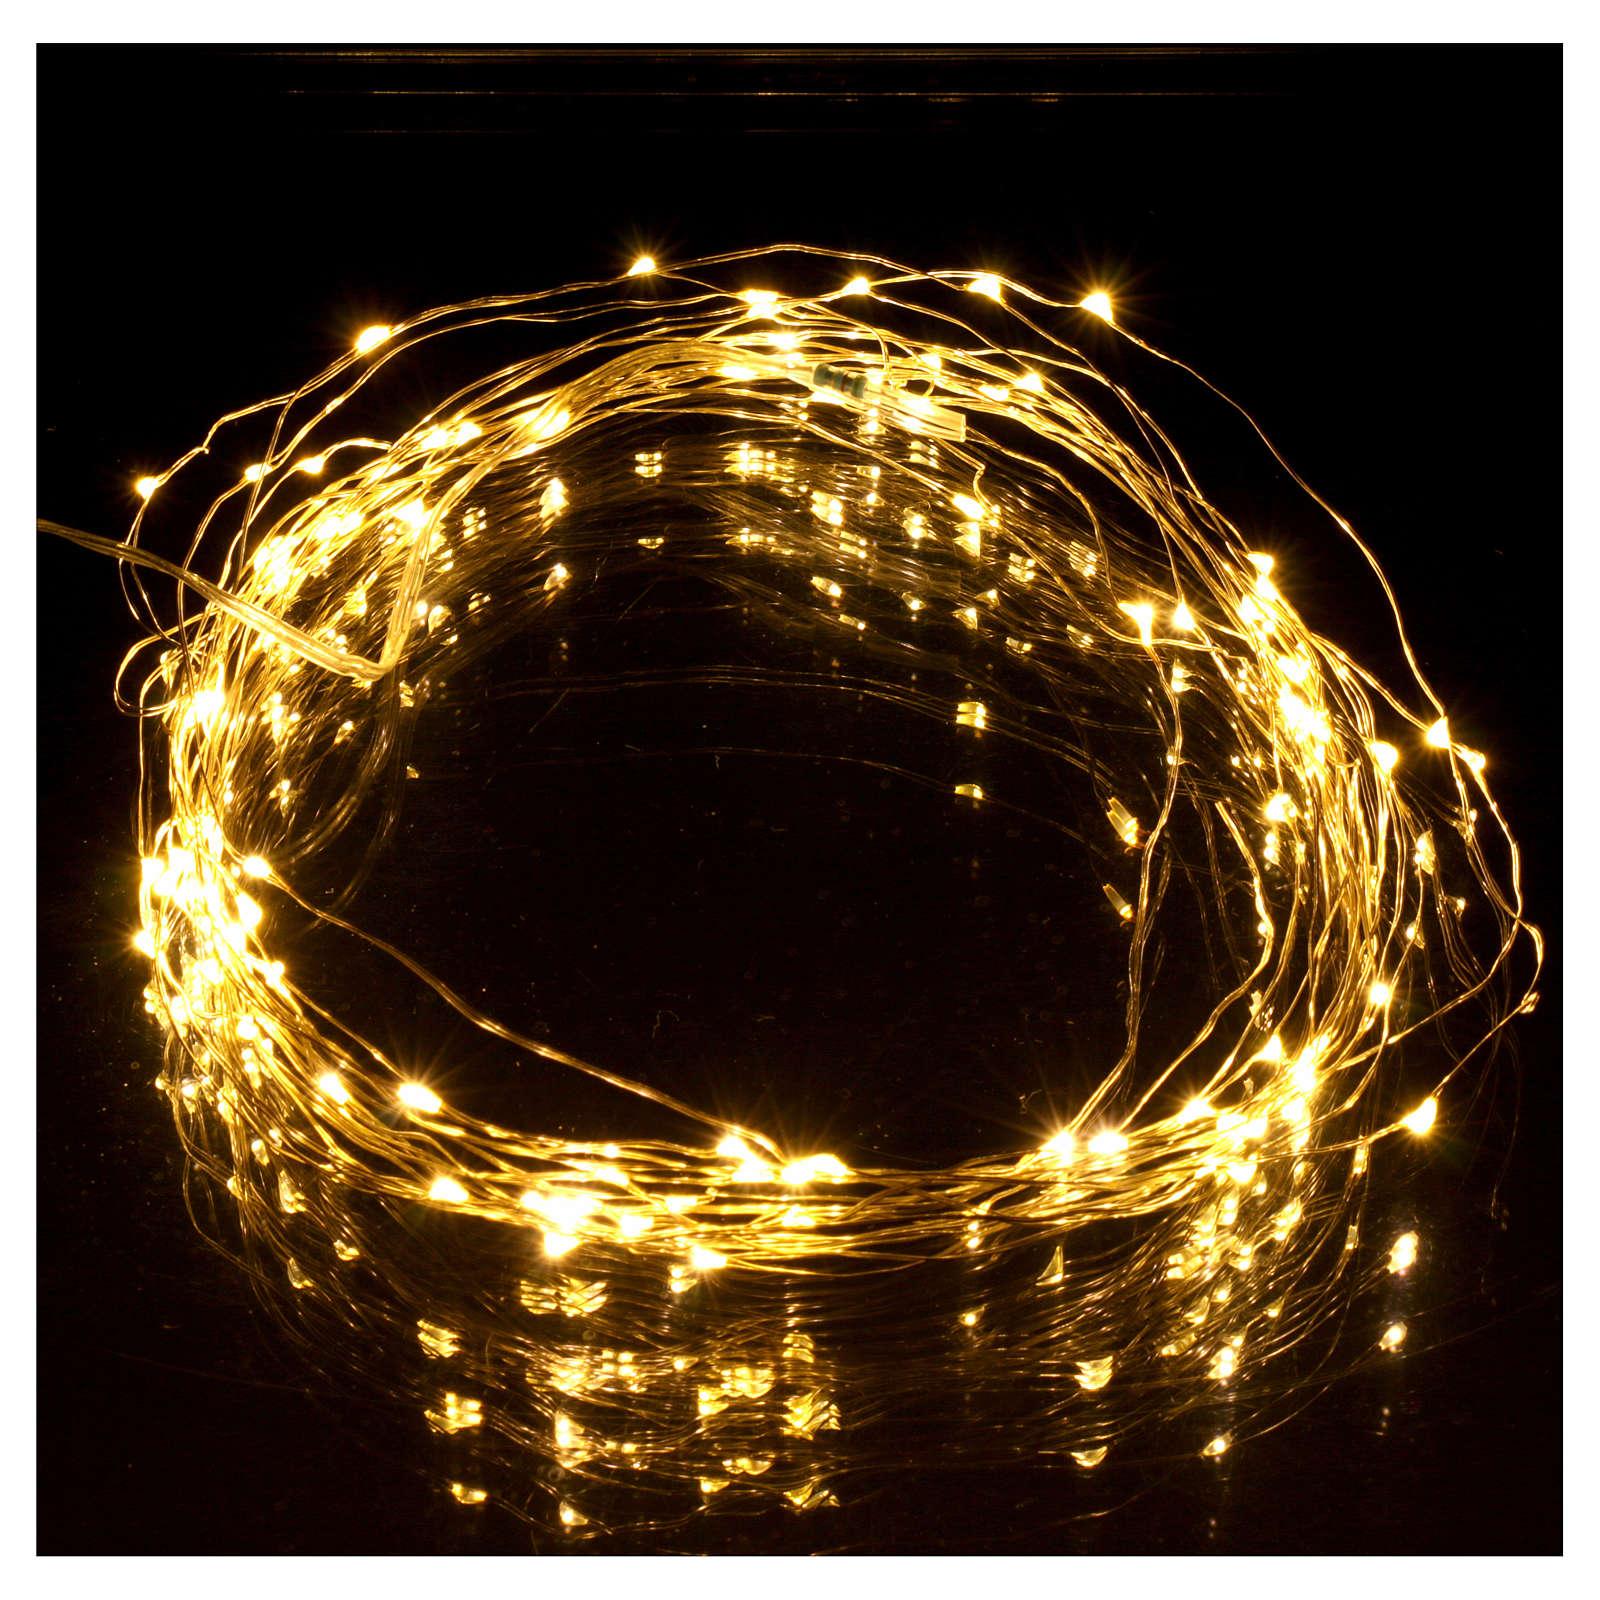 Illuminated wire 100 nano leds warm white internal use 3